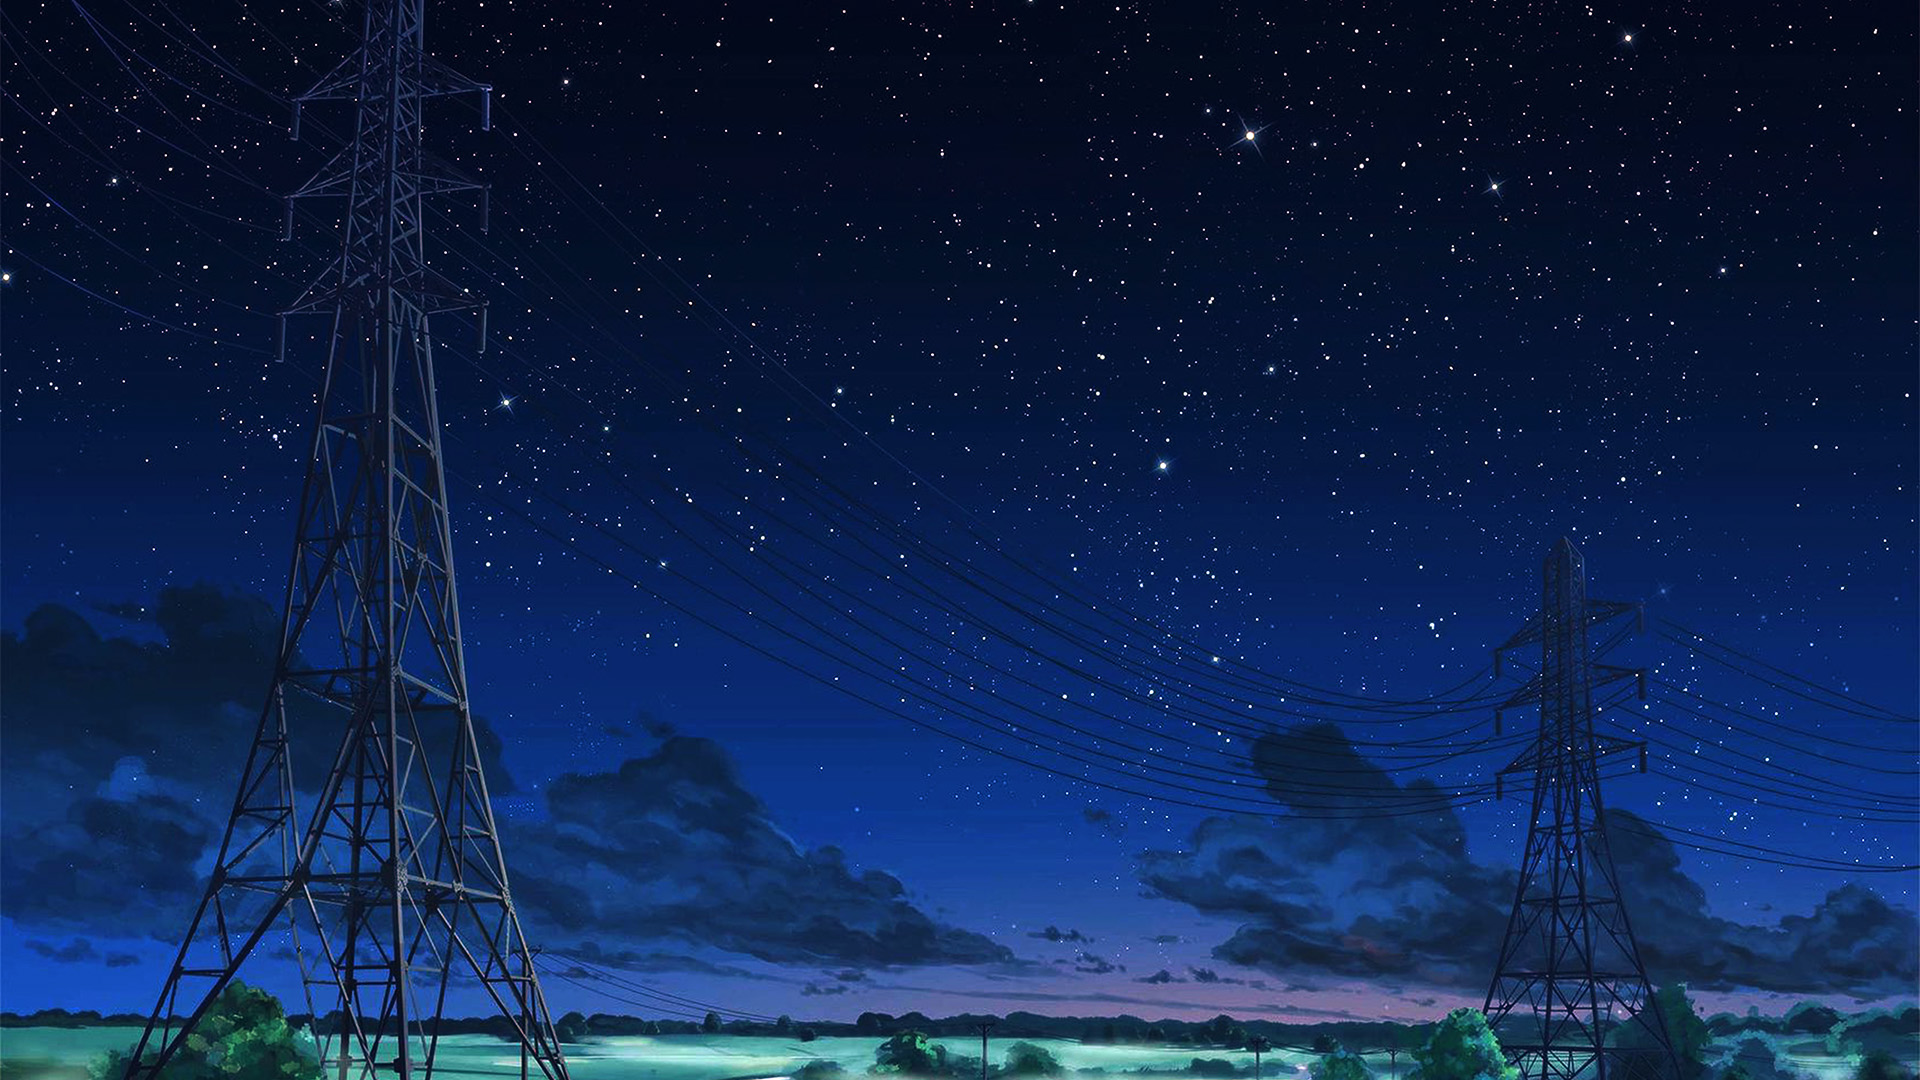 Hd Phone Wallpapers Fall Aw16 Arseniy Chebynkin Night Sky Star Blue Illustration